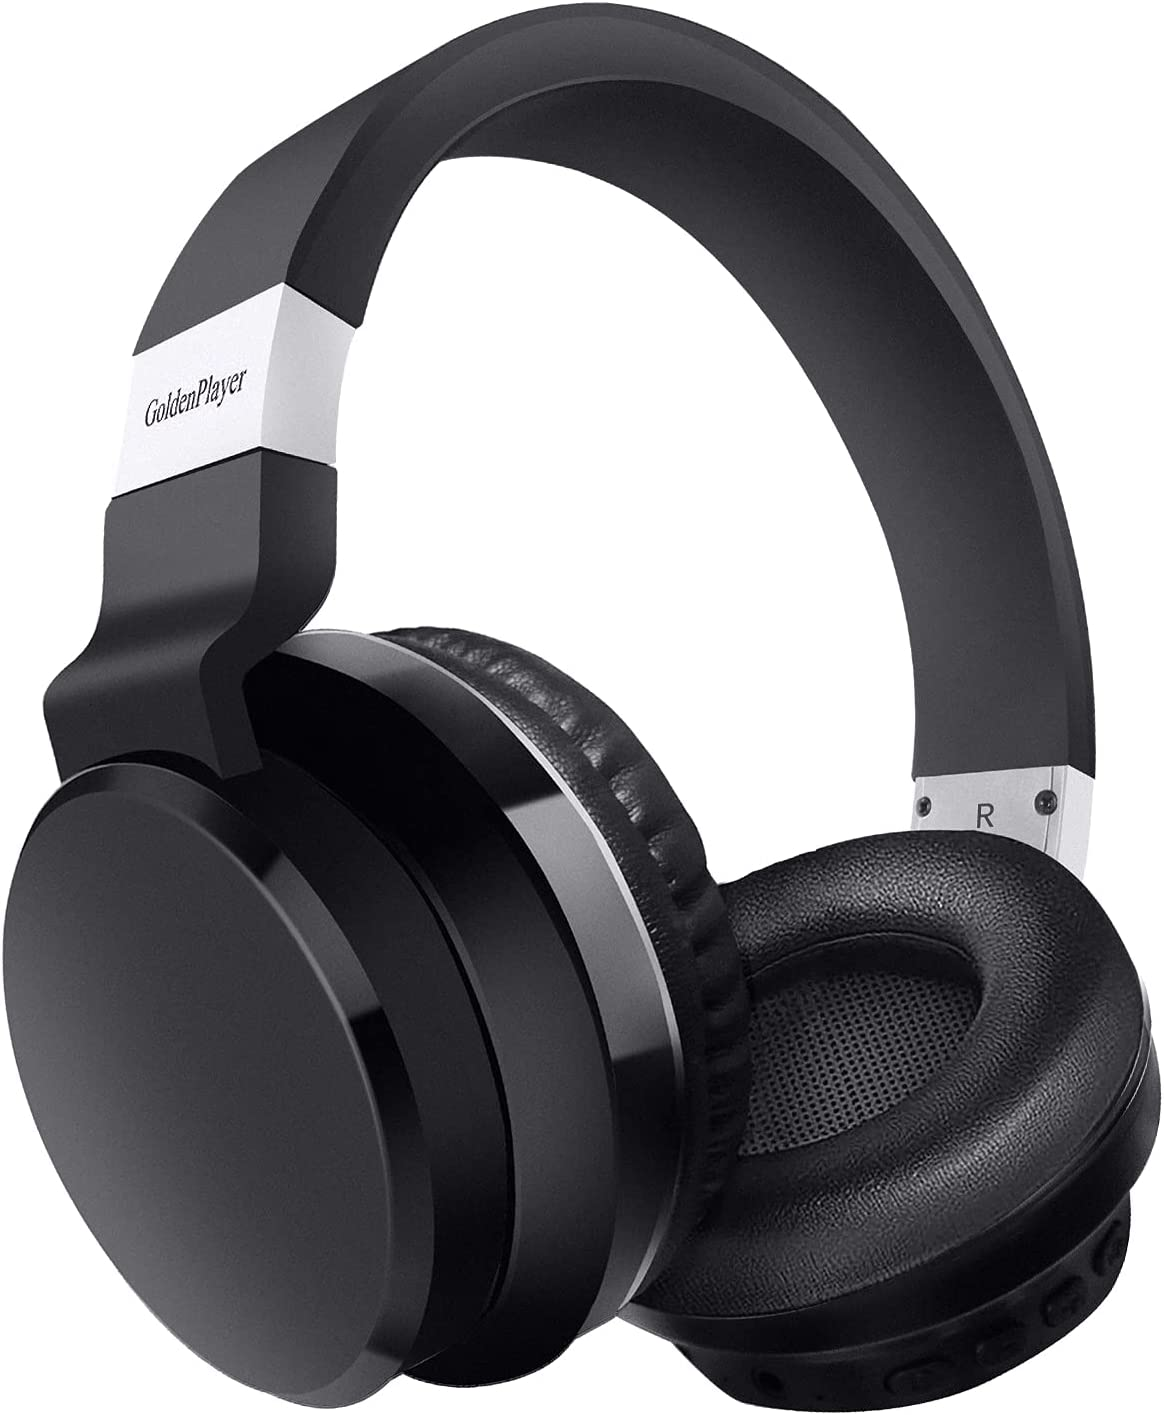 GoldenPlayer Wireless Headphones  $18.50 Coupon